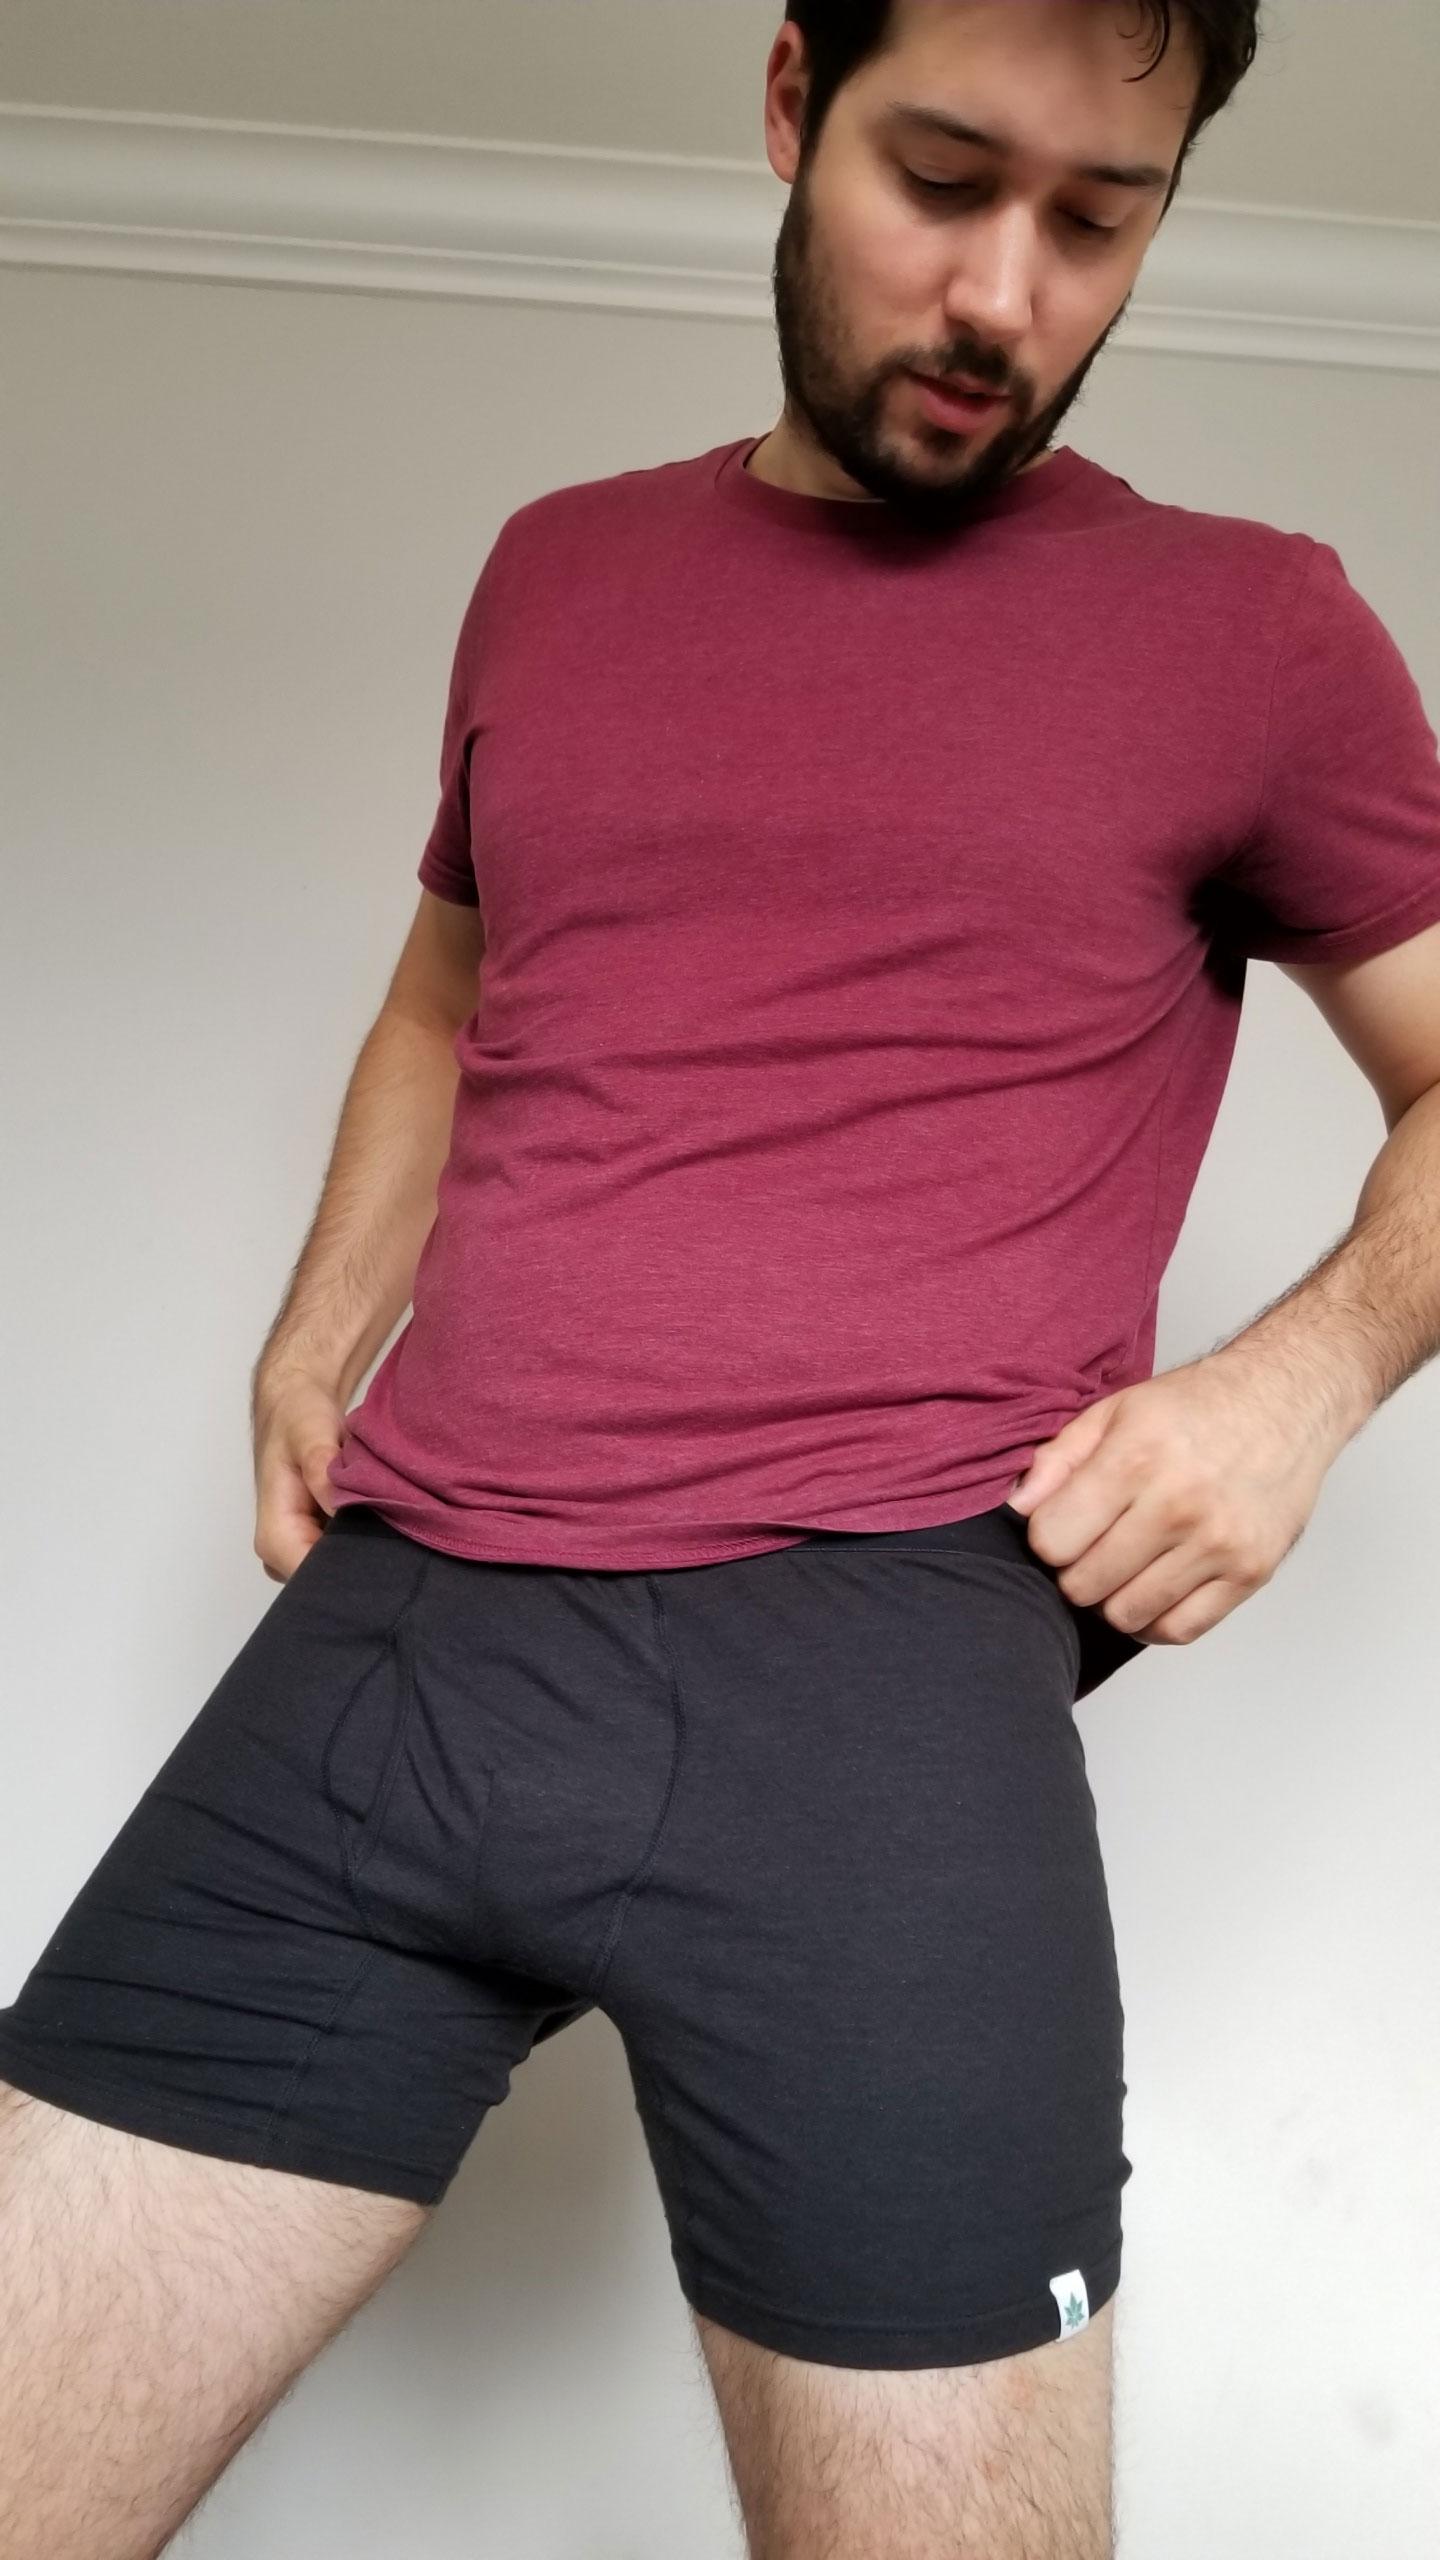 WAMA Men's Hemp Boxer Brief Review